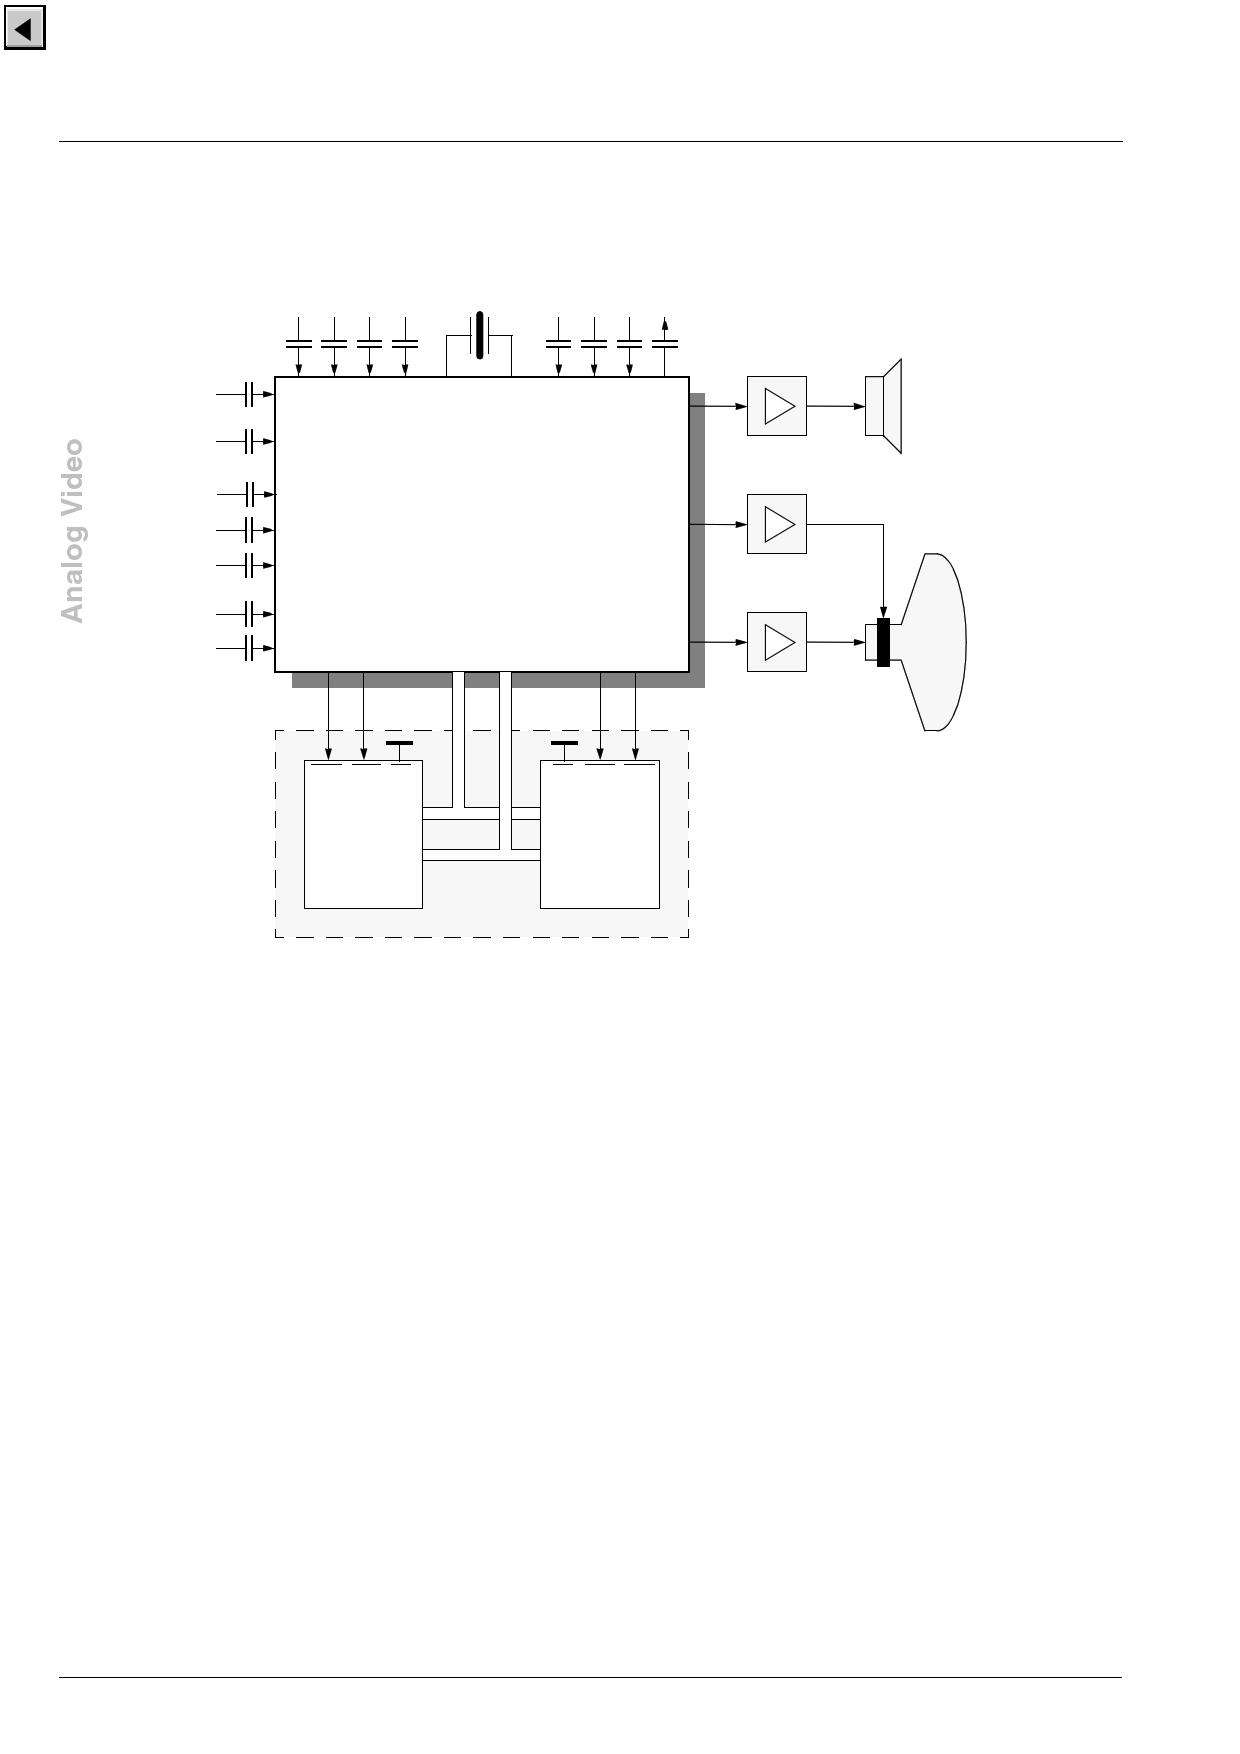 VCT3803A arduino